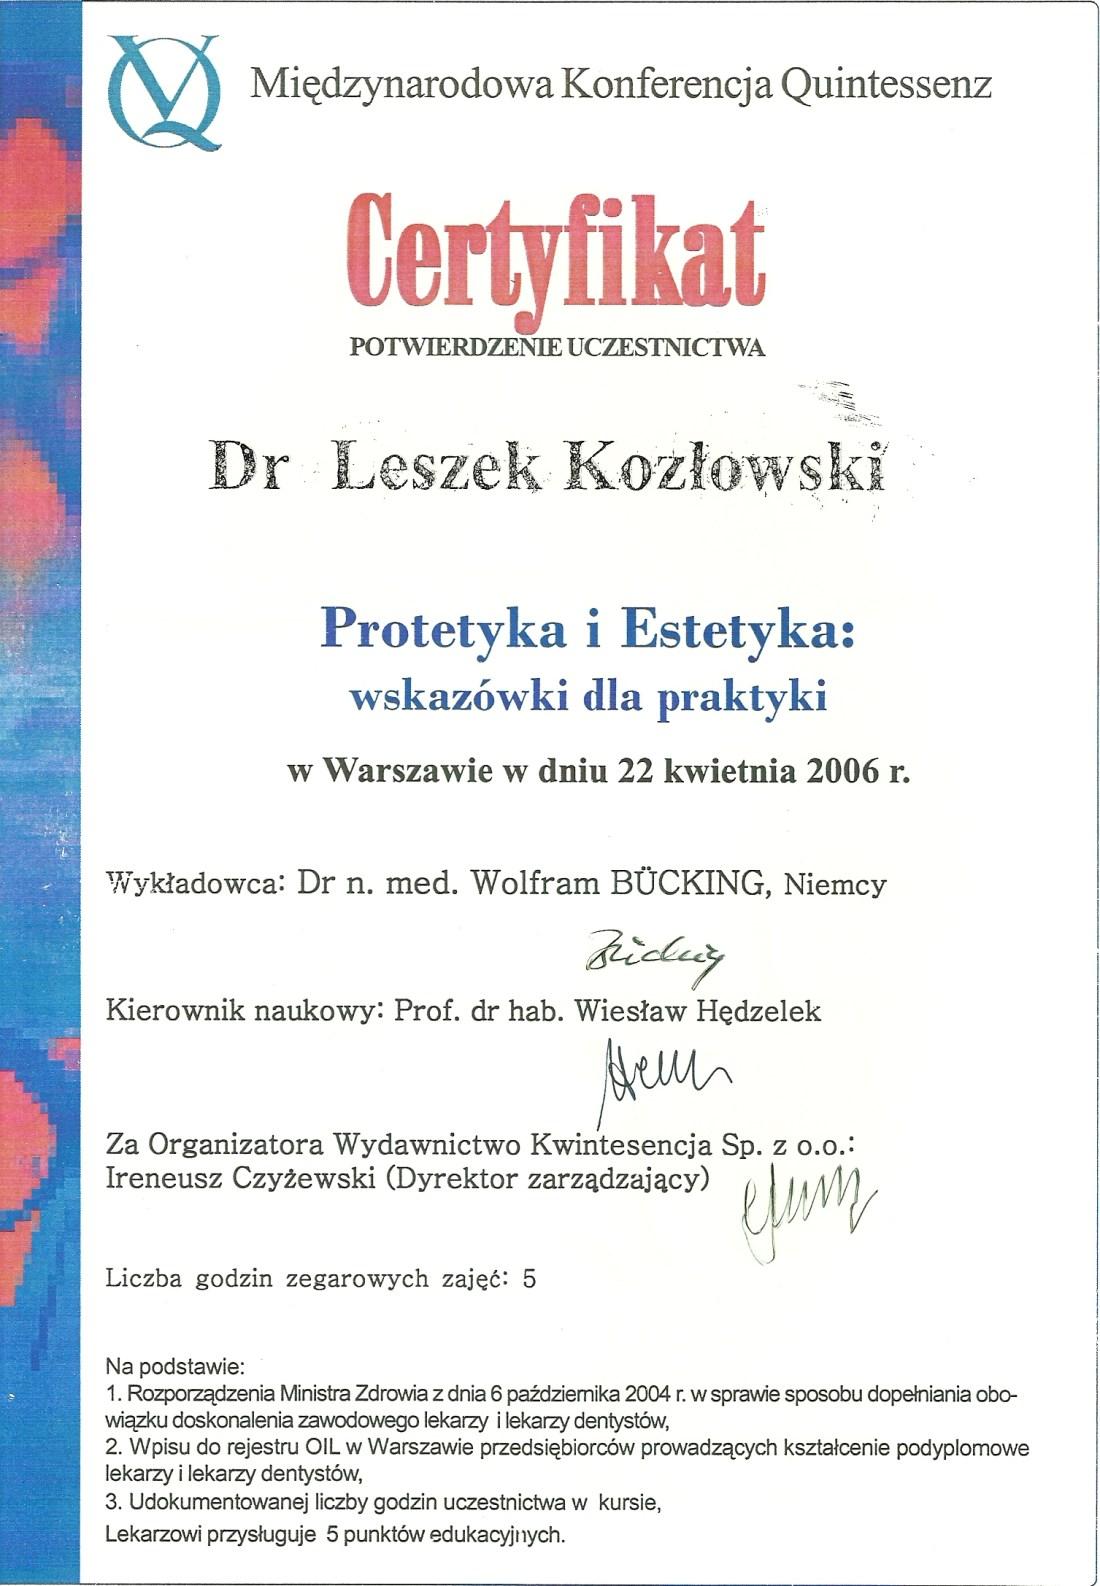 dentysta warszawa DENTYSTA WARSZAWA – DENTOKLINIKA Dentysta warszawa Leszek Kozlowski Certyfikat 4